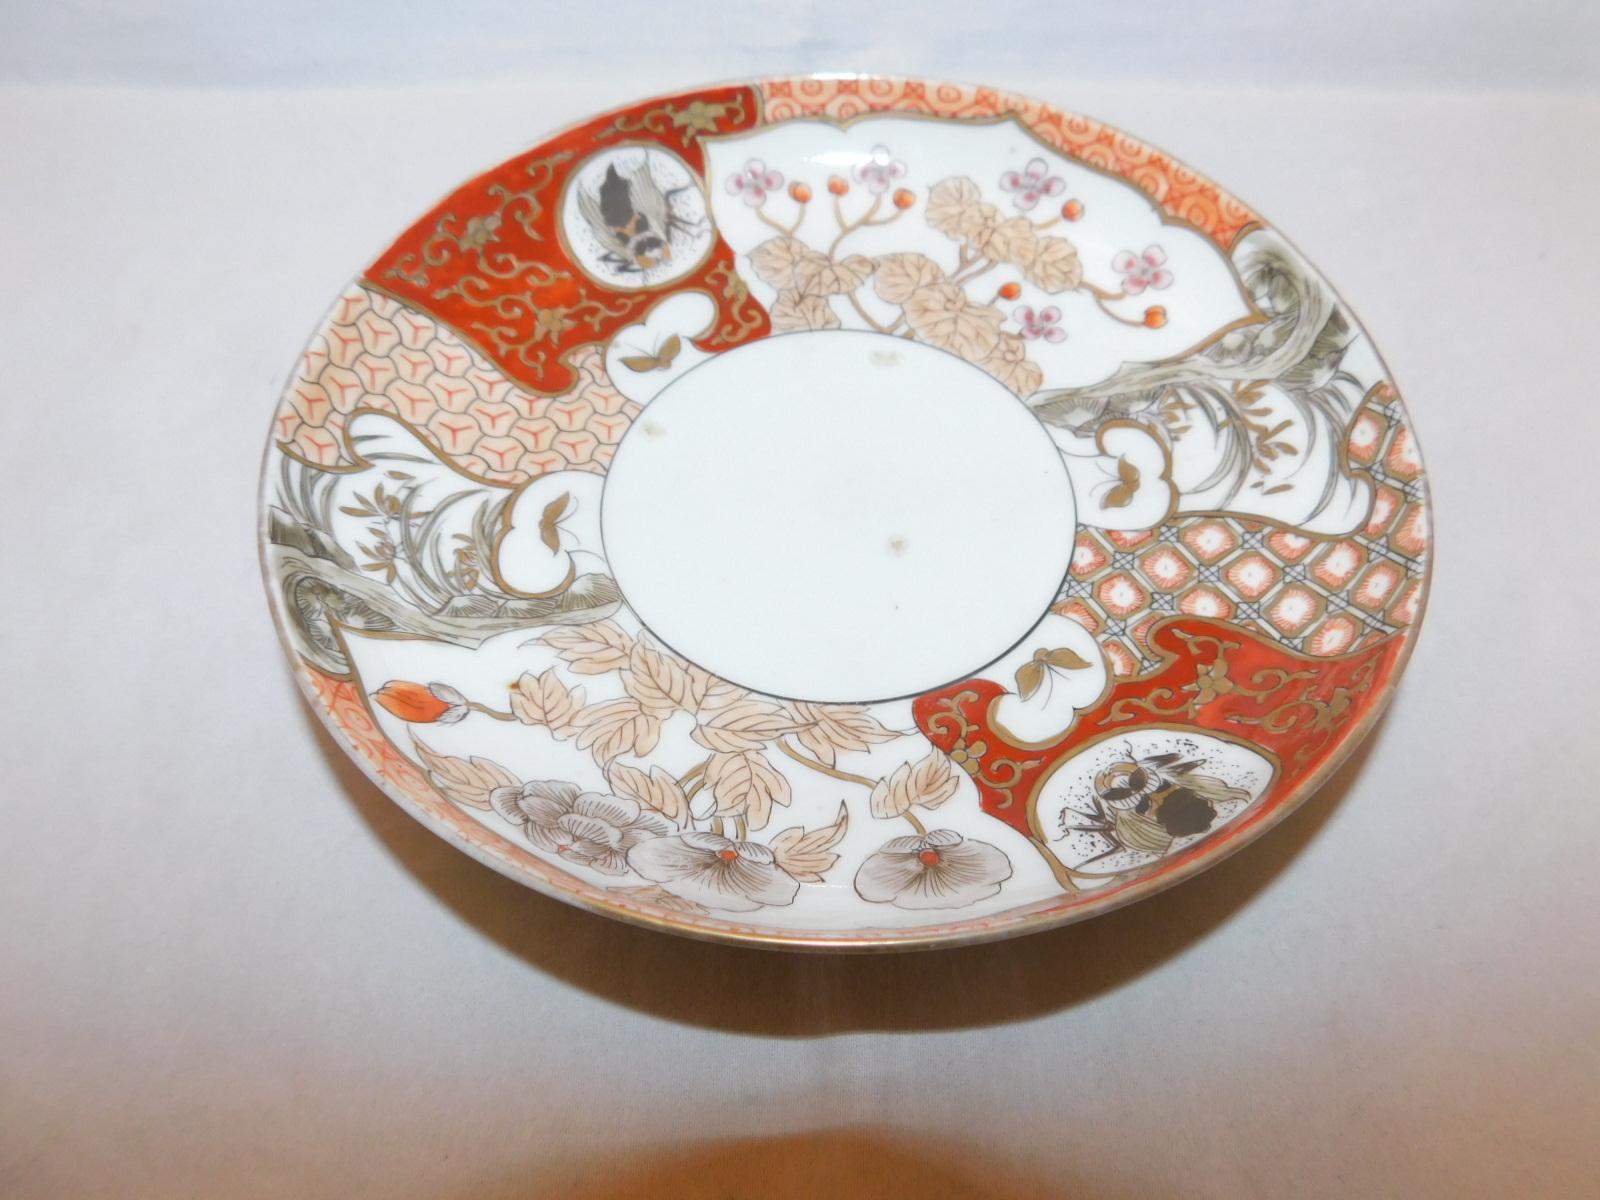 色絵五寸皿(蔵春亭三保 造) collard porcelain plate(Sanho Kurasyuntei signature)